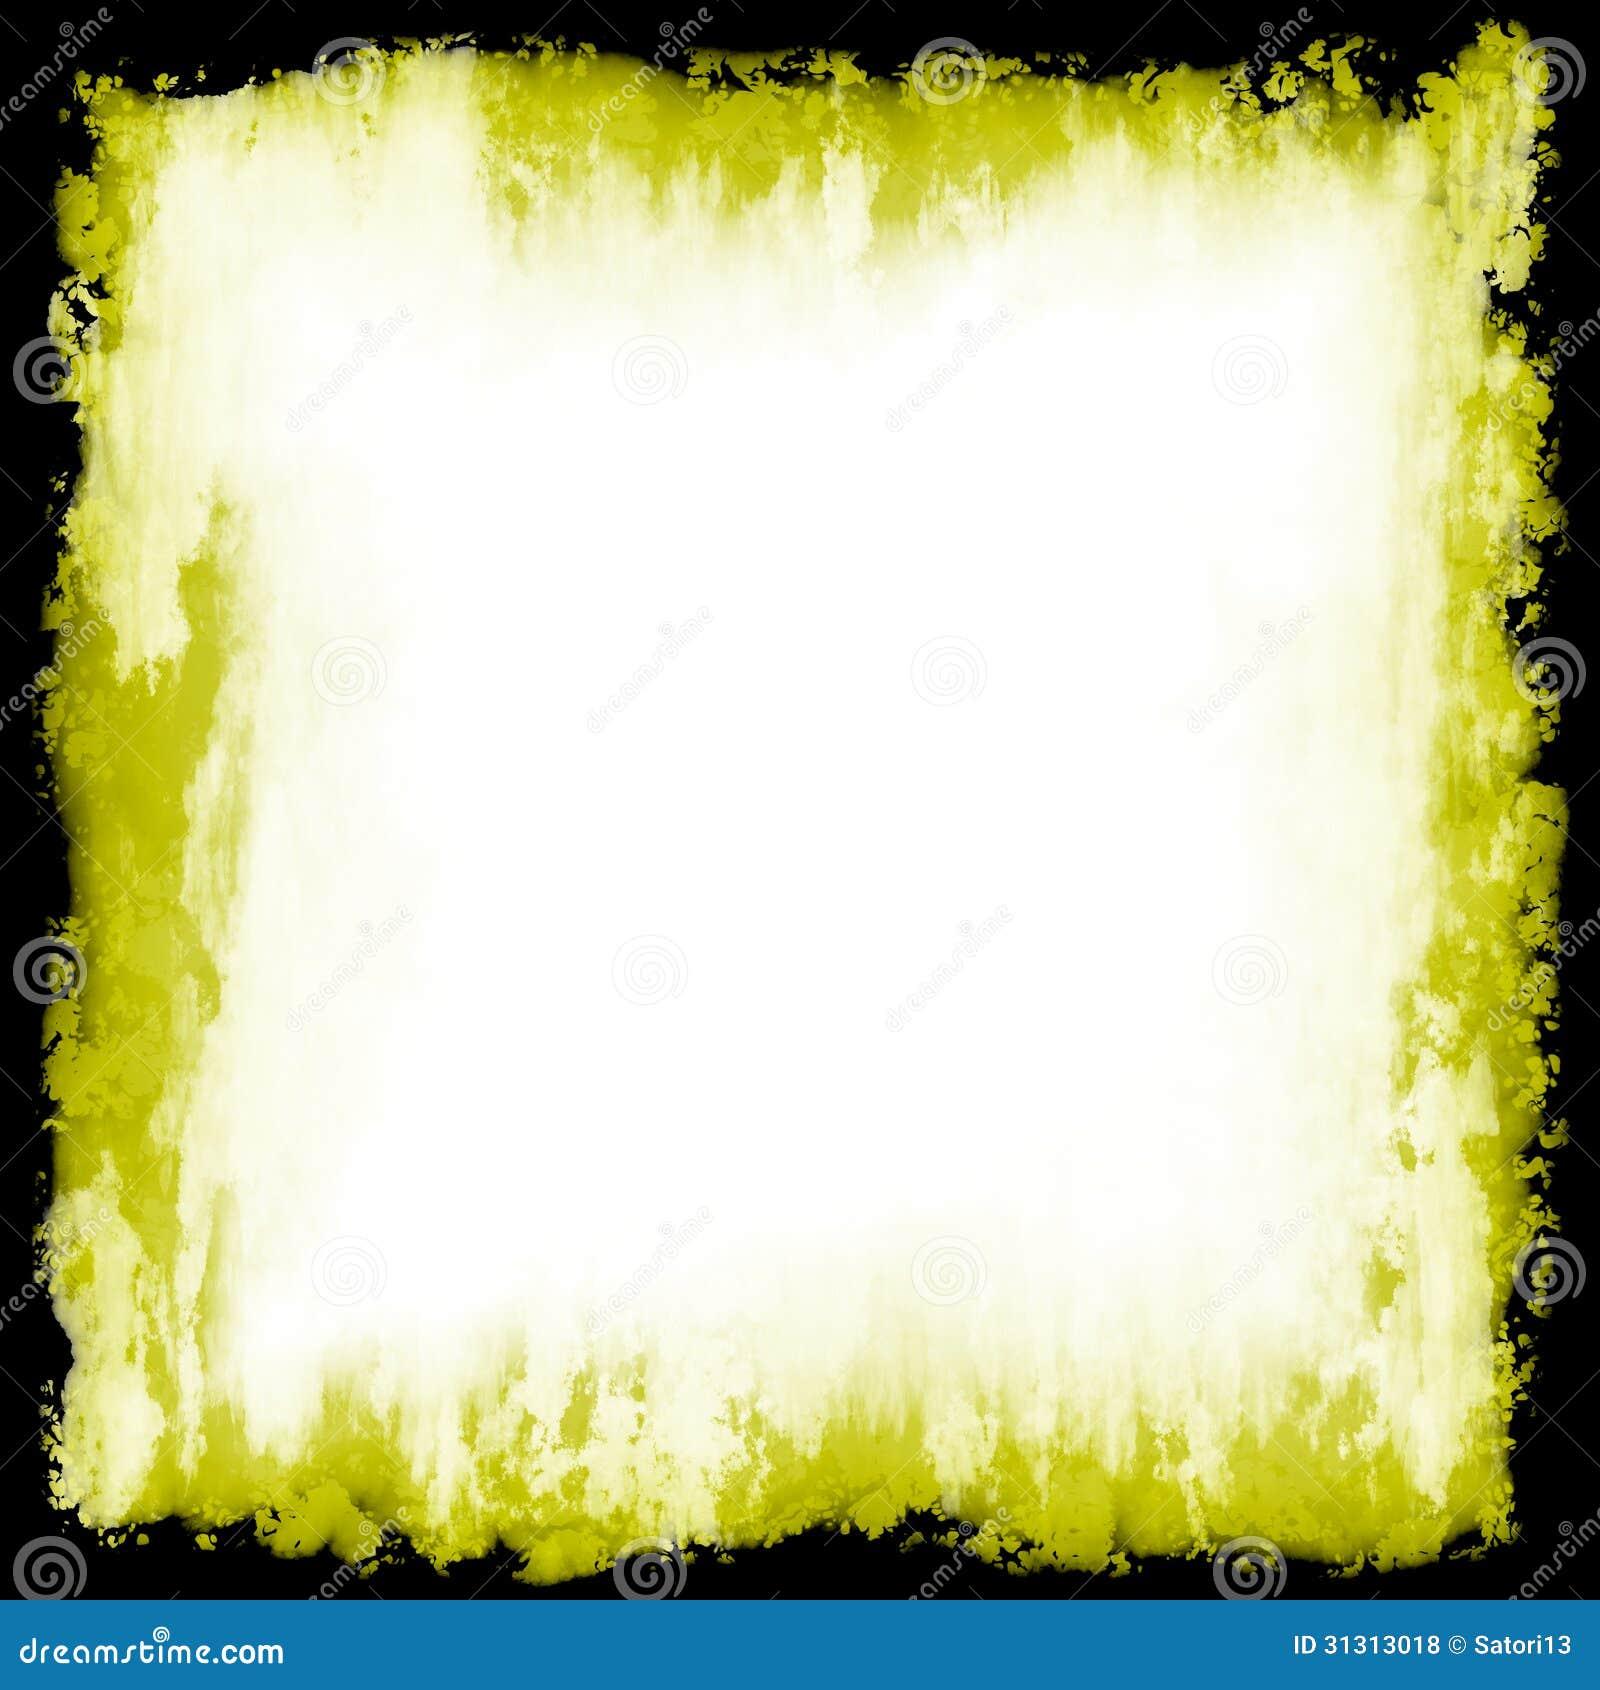 Grunge frame stock illustration. Illustration of yellow - 31313018